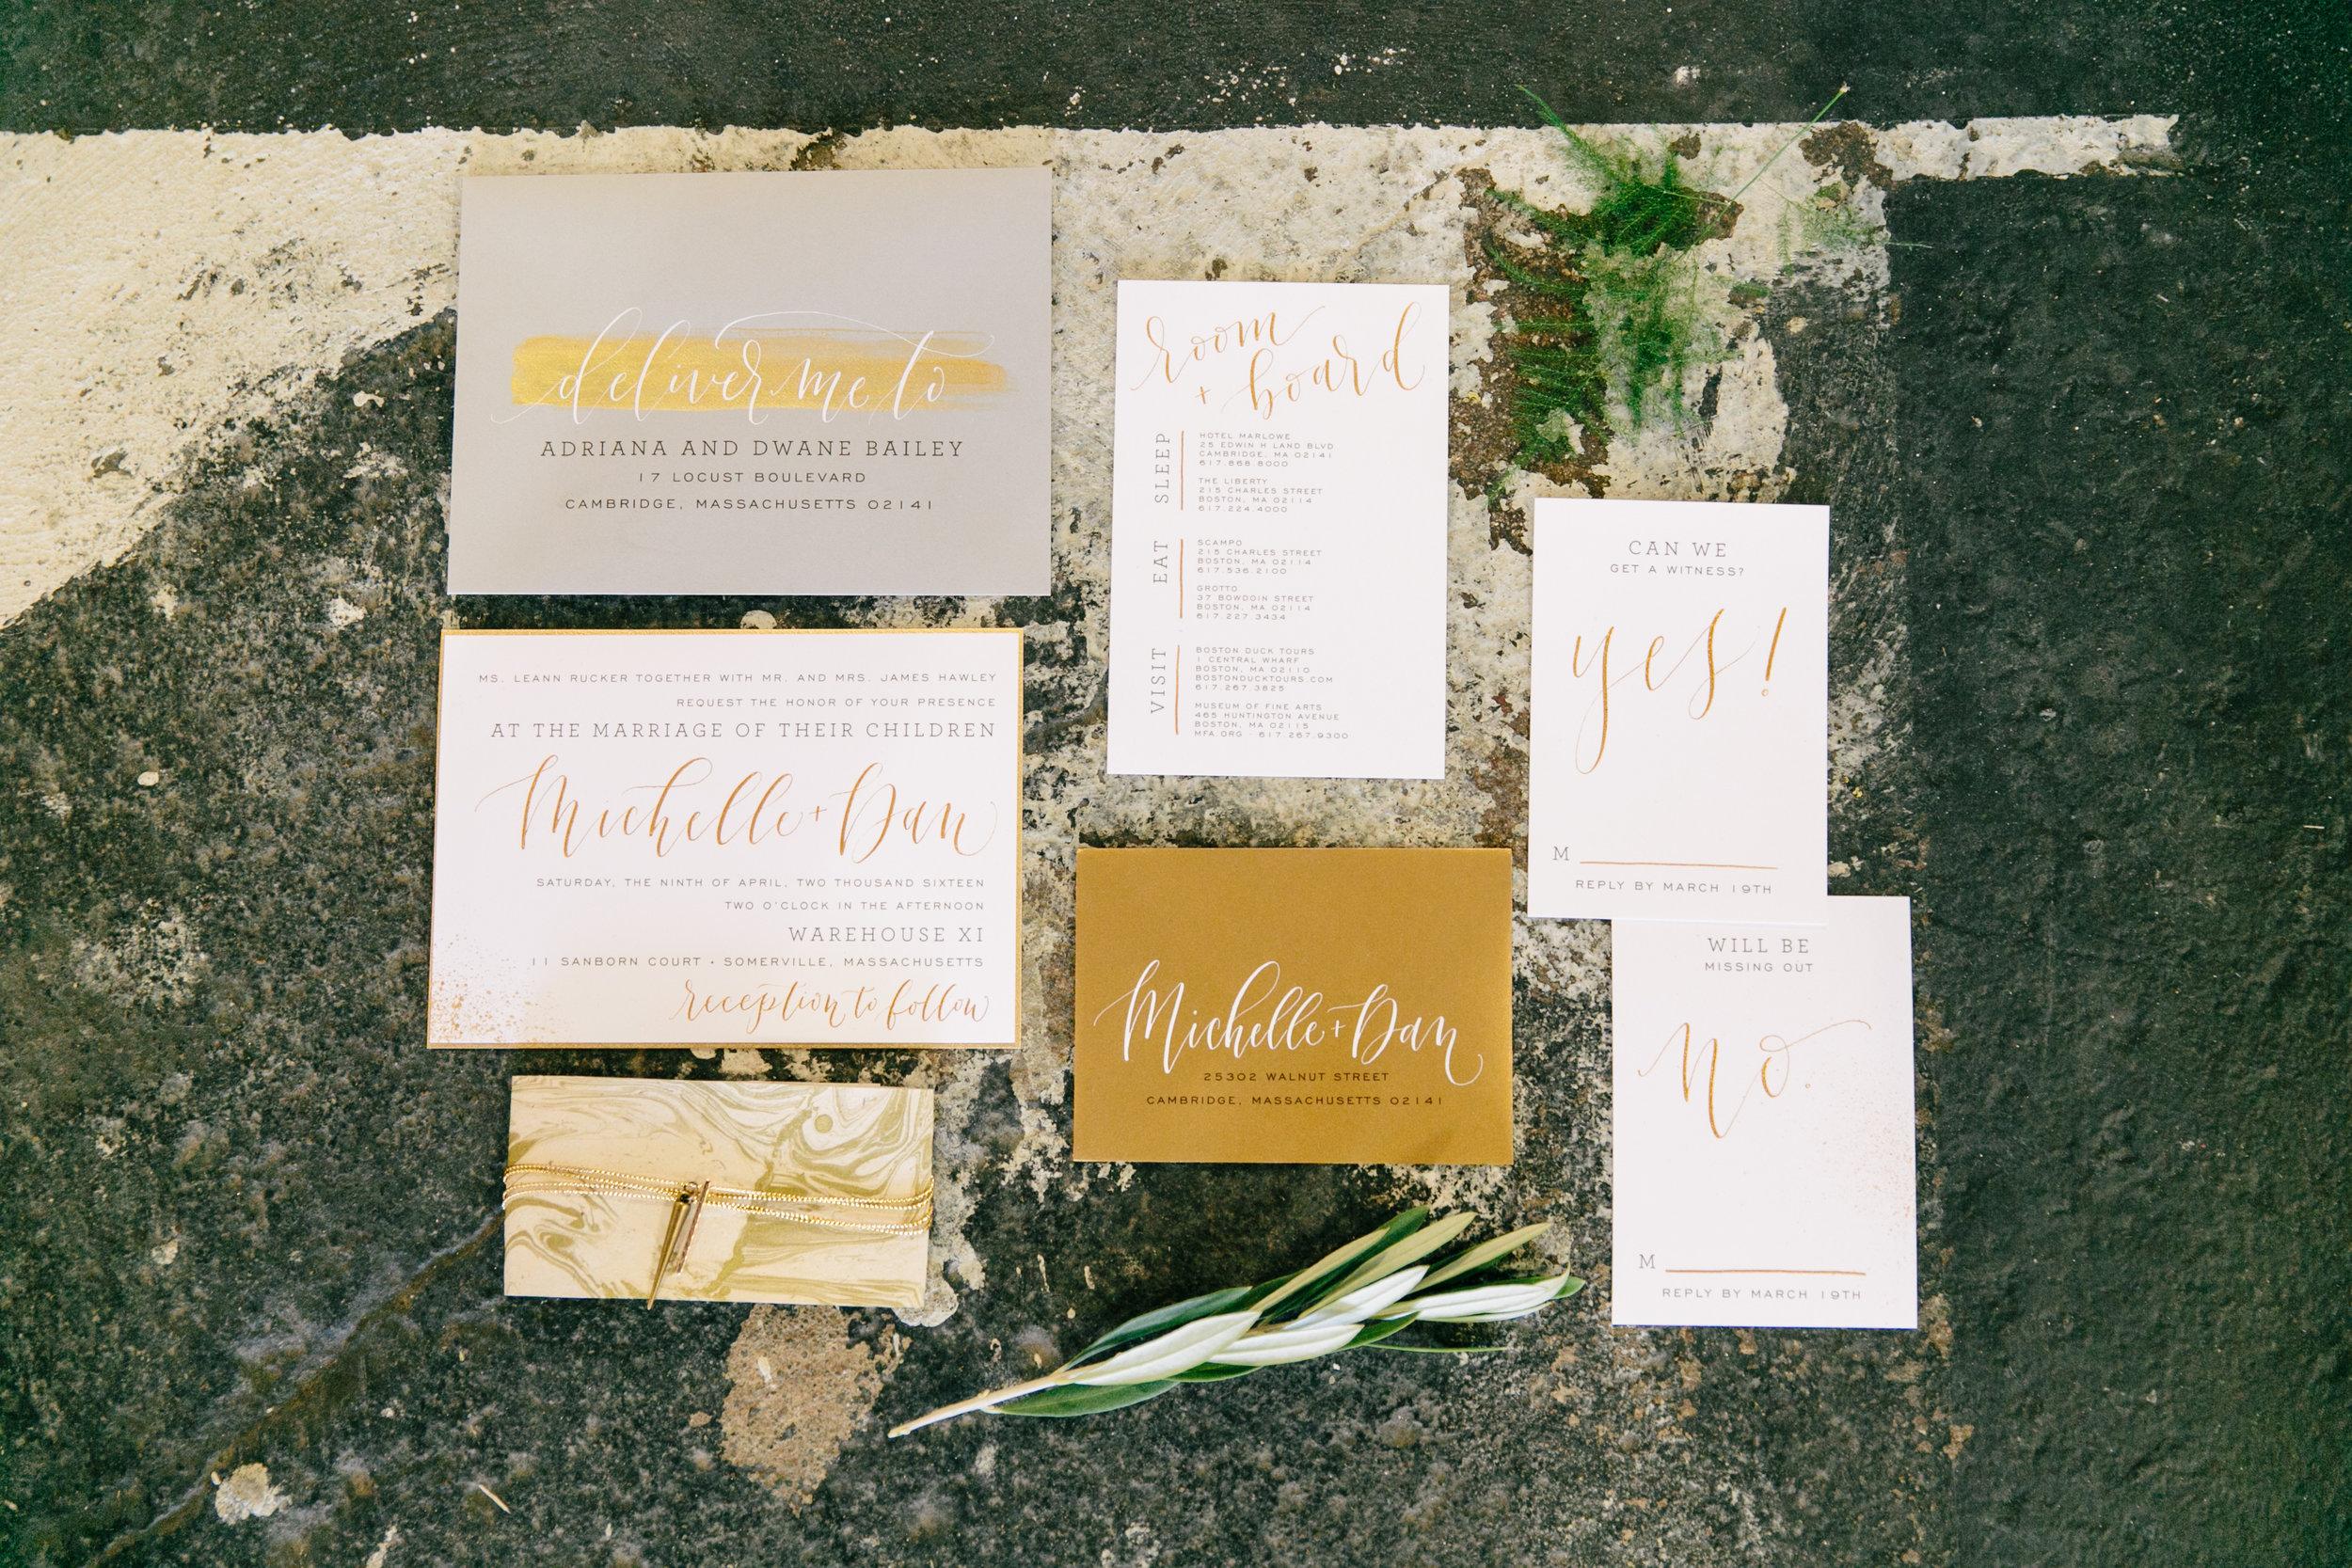 WarehouseXI-somerville-MA-wedding-photography0308-160.jpg